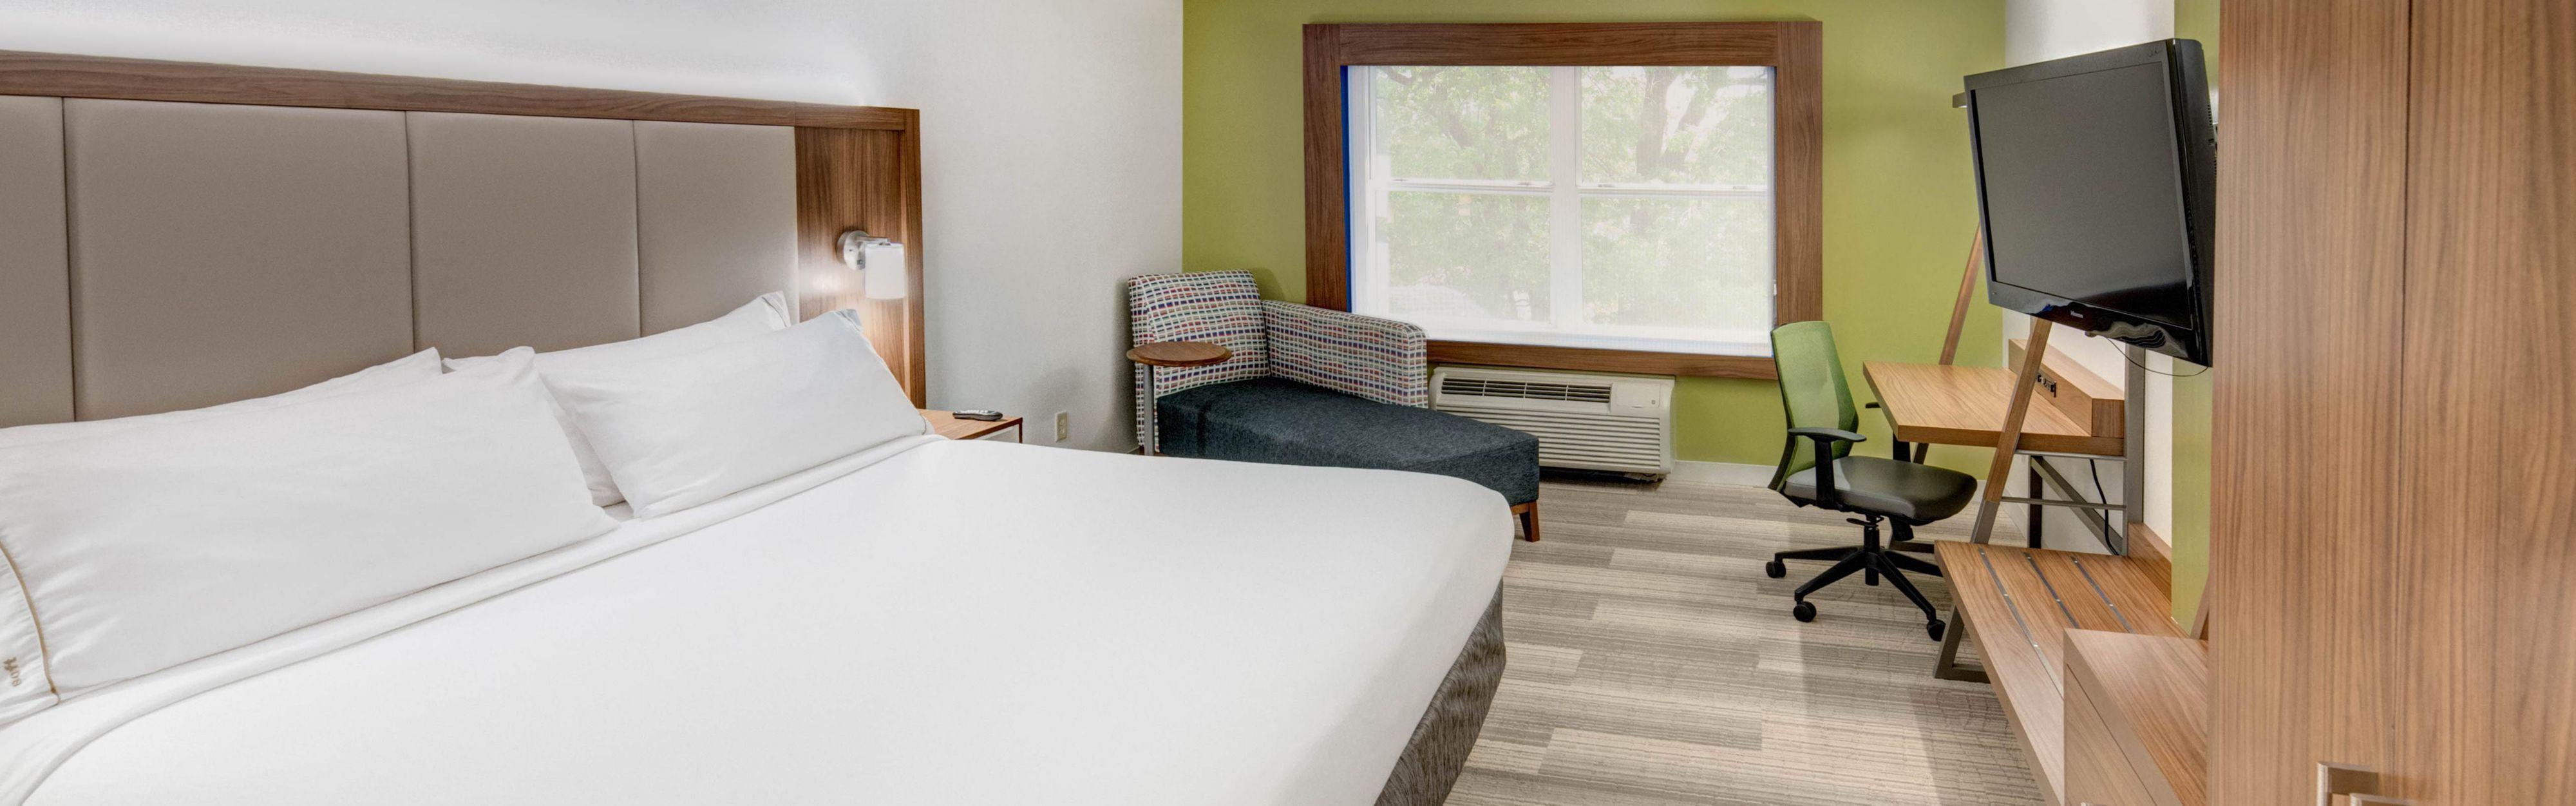 Holiday inn express suites woodbridge in avenel nj for La mirage motor inn avenel nj